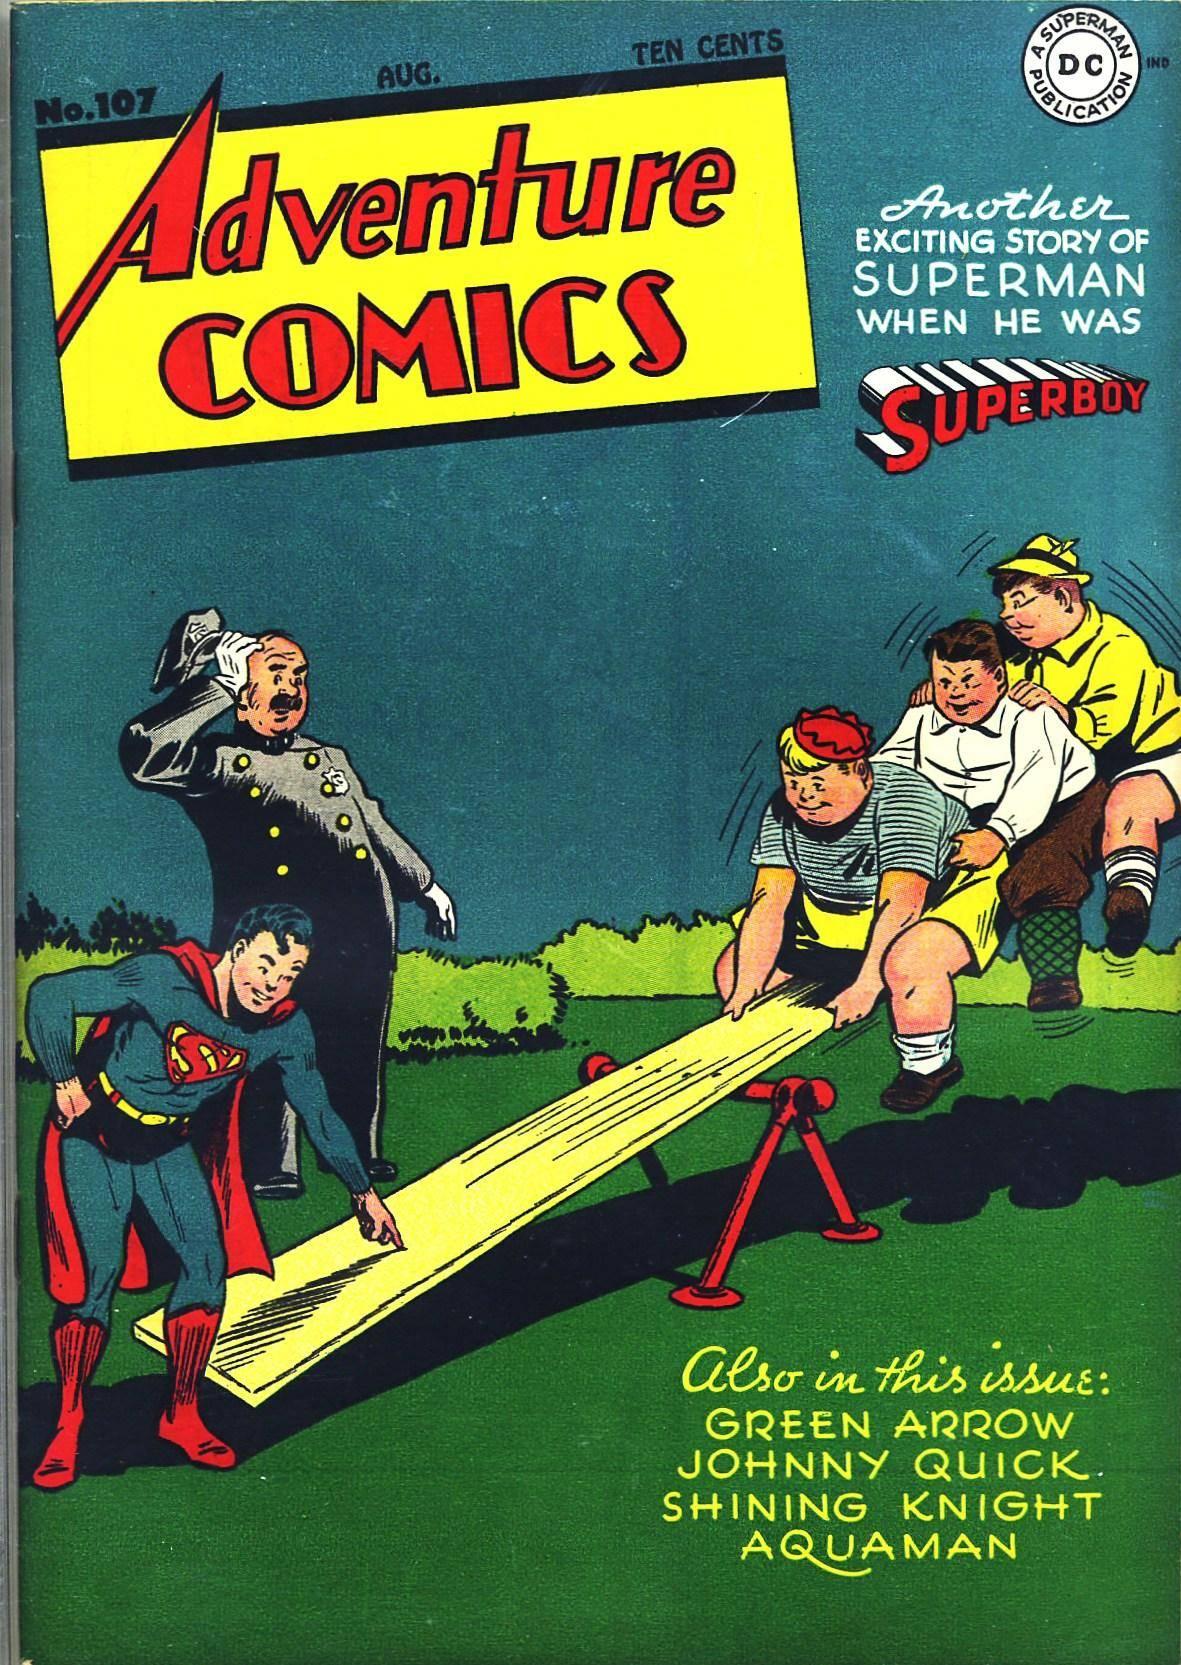 Adventure Comics 1946-08 107